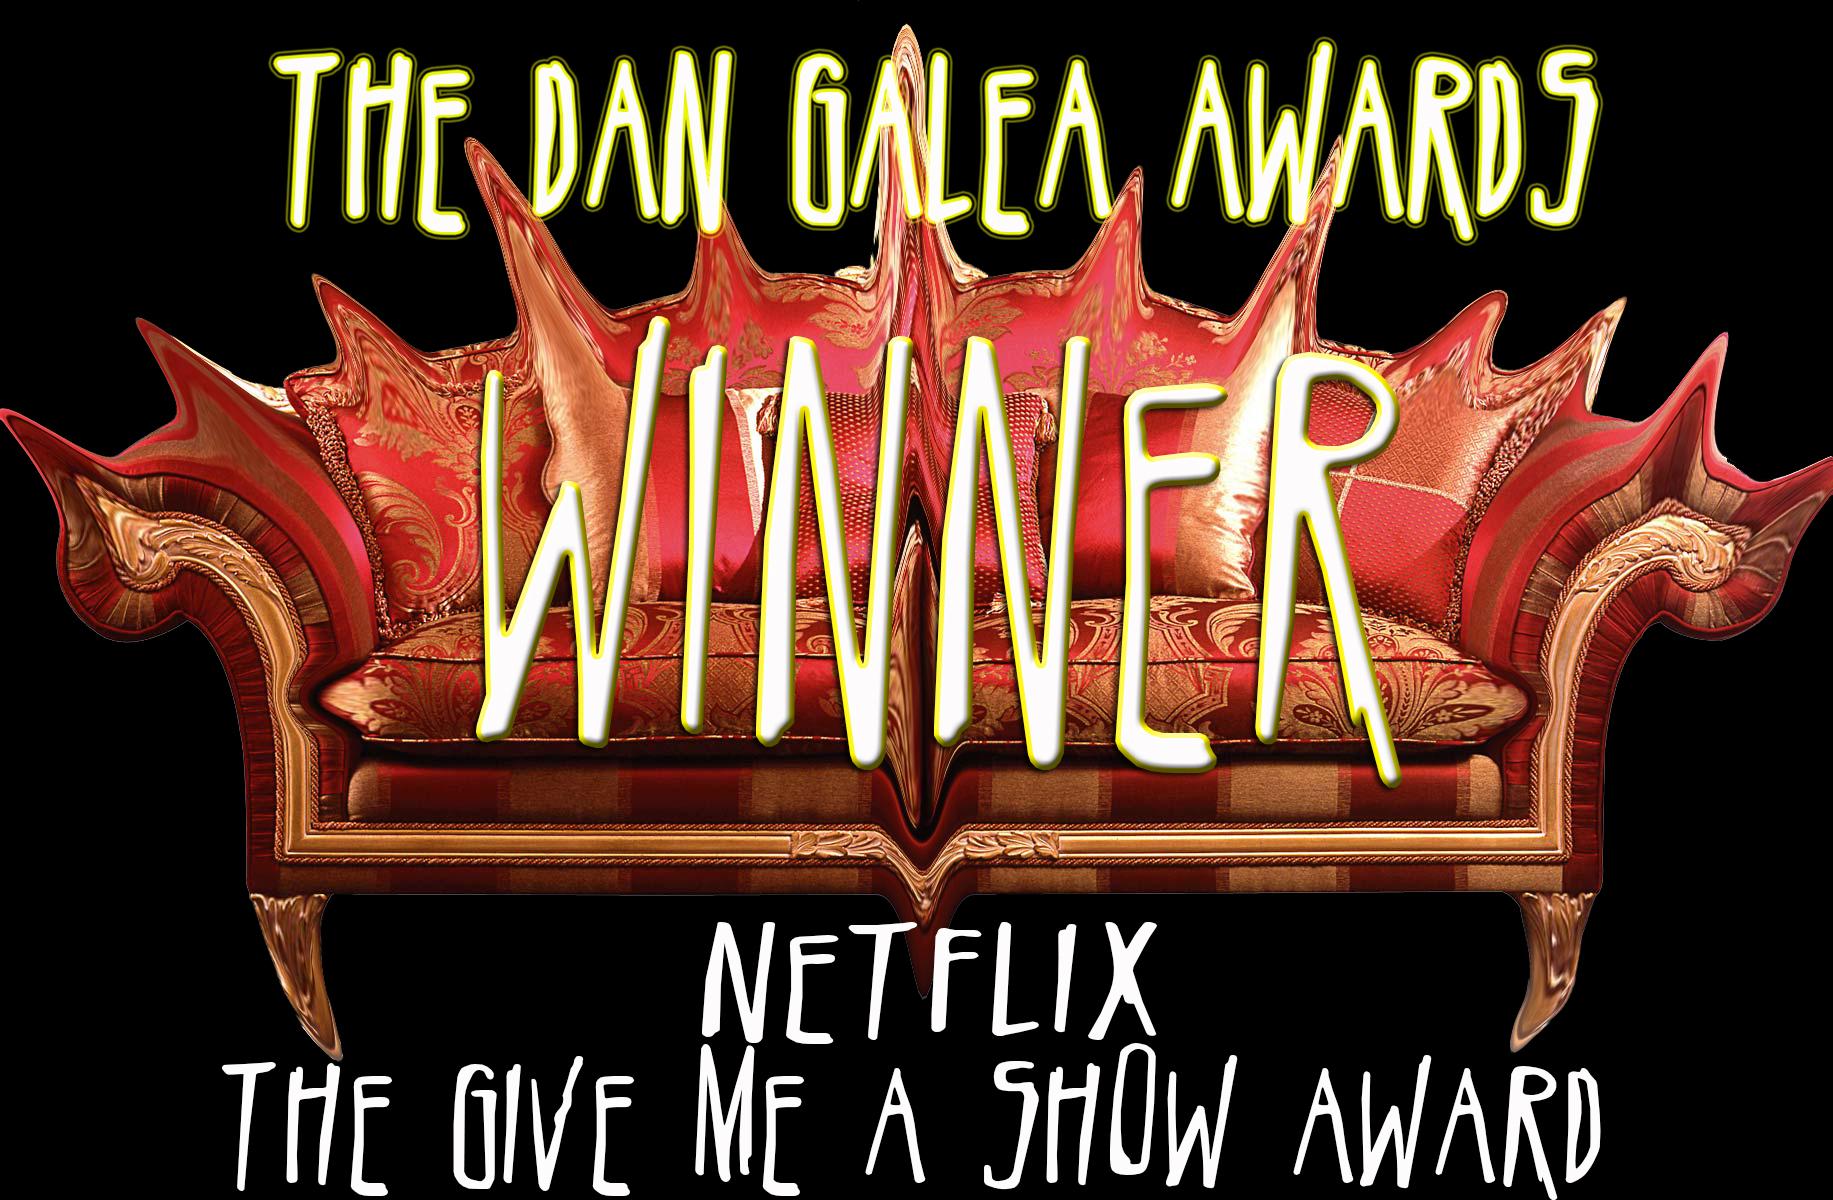 DGAWARDS Netflix.jpg